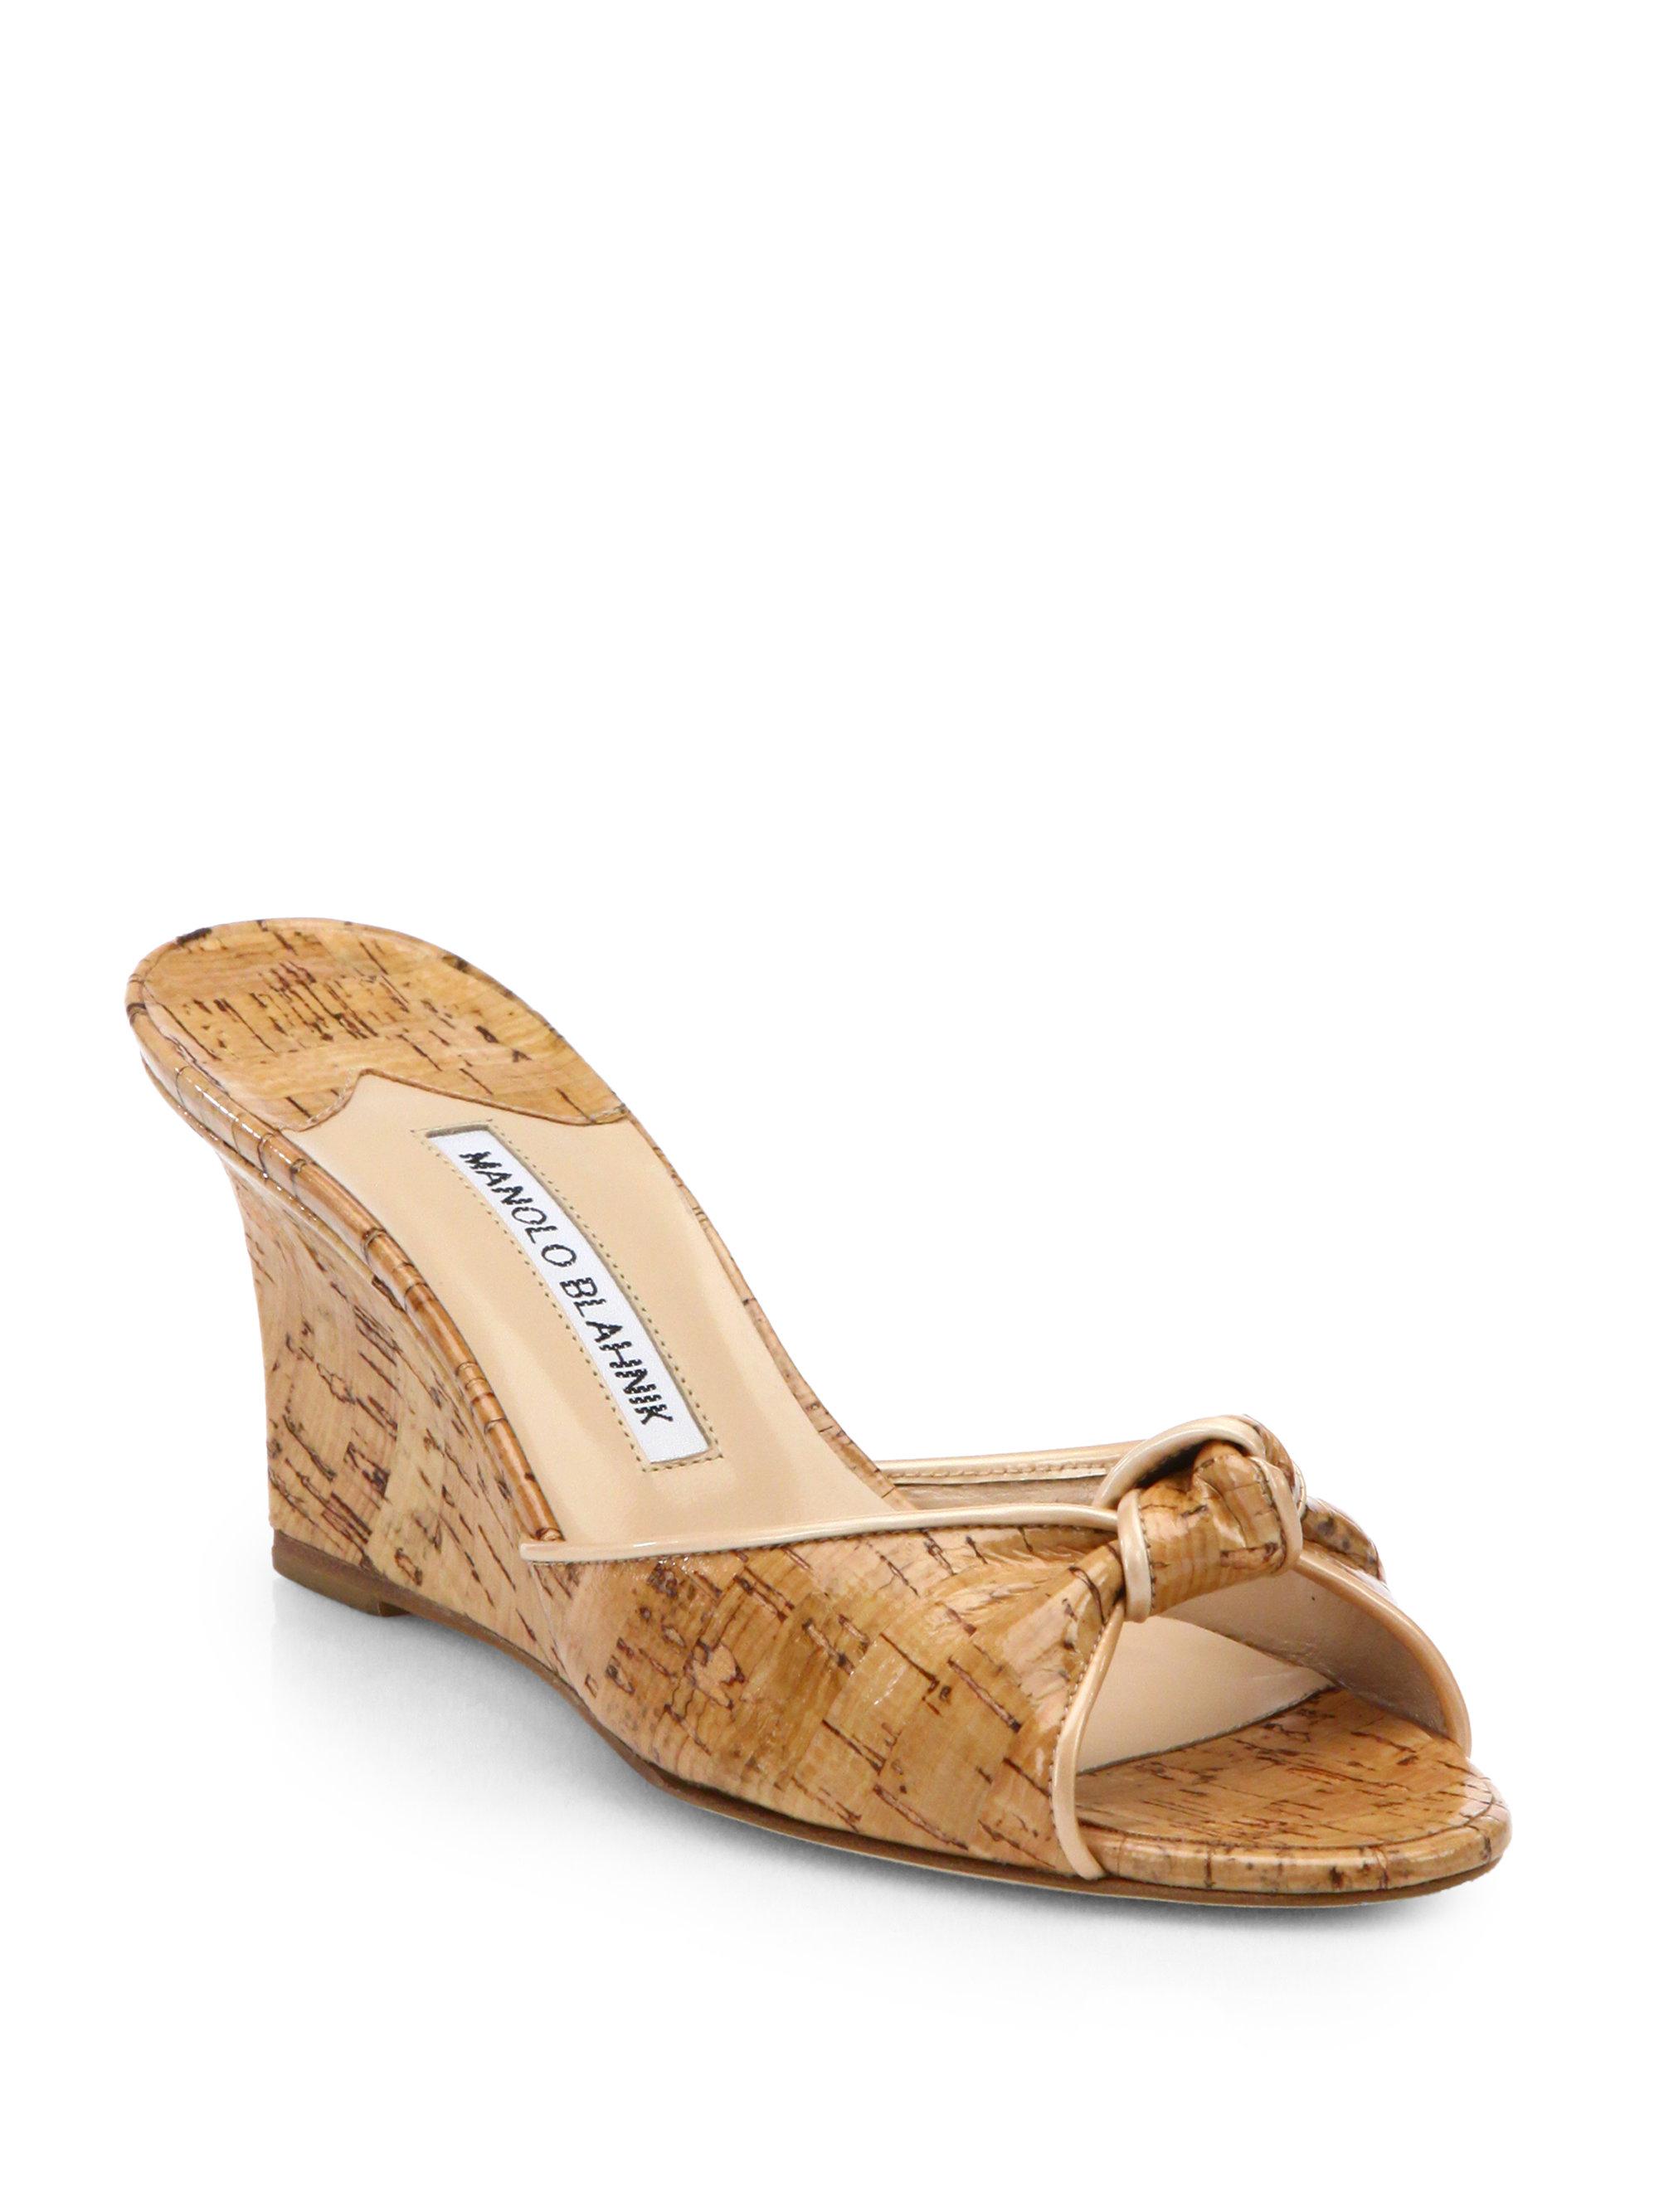 Manolo Blahnik Cork Wedge Slide Sandals In Natural Lyst